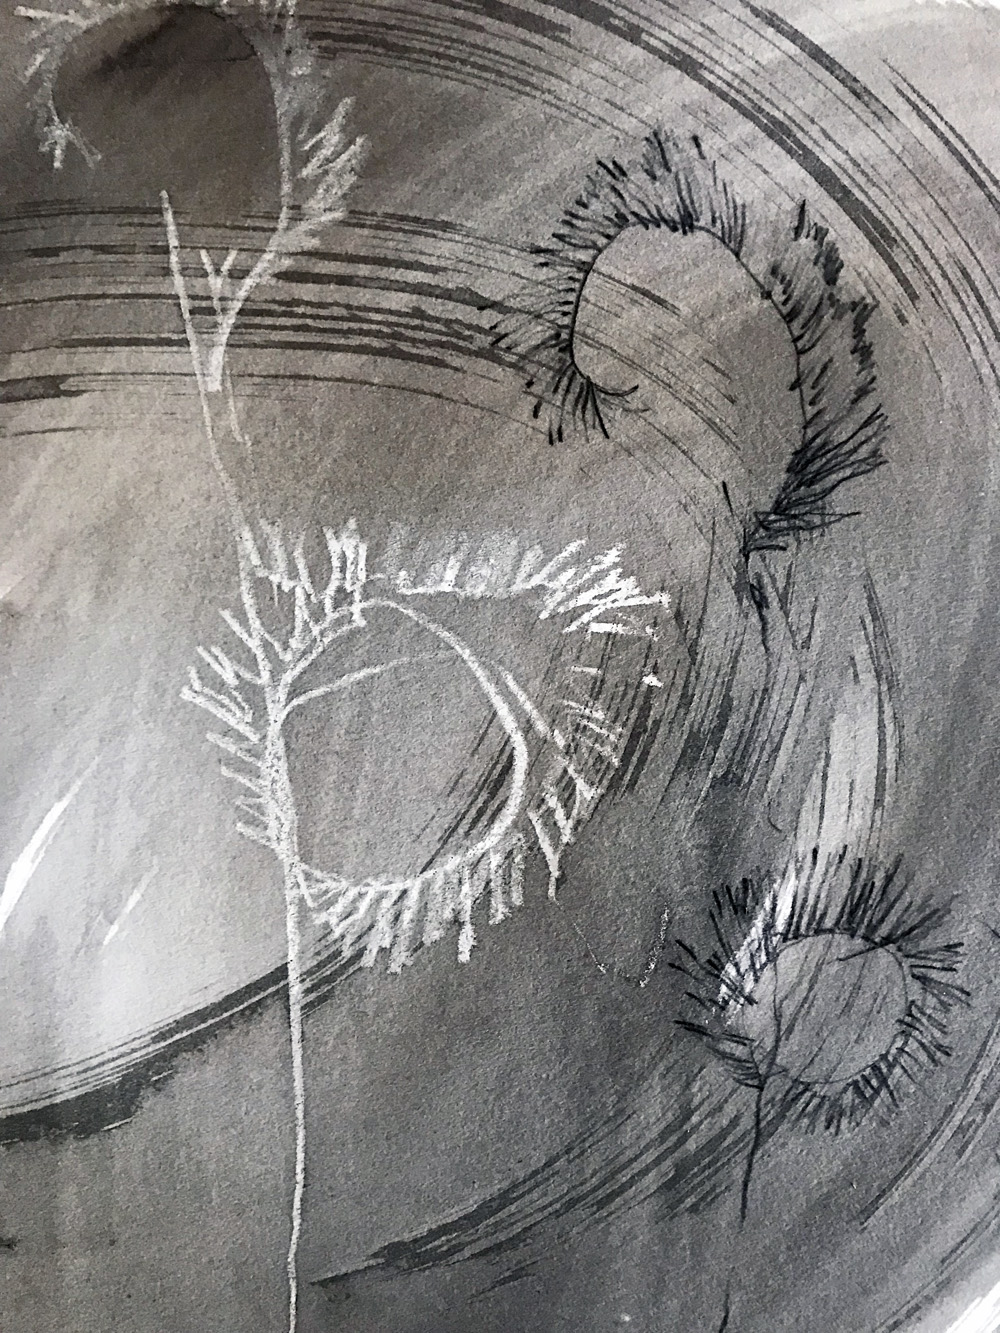 Blind contour drawing of desert grass, Katie Barnes